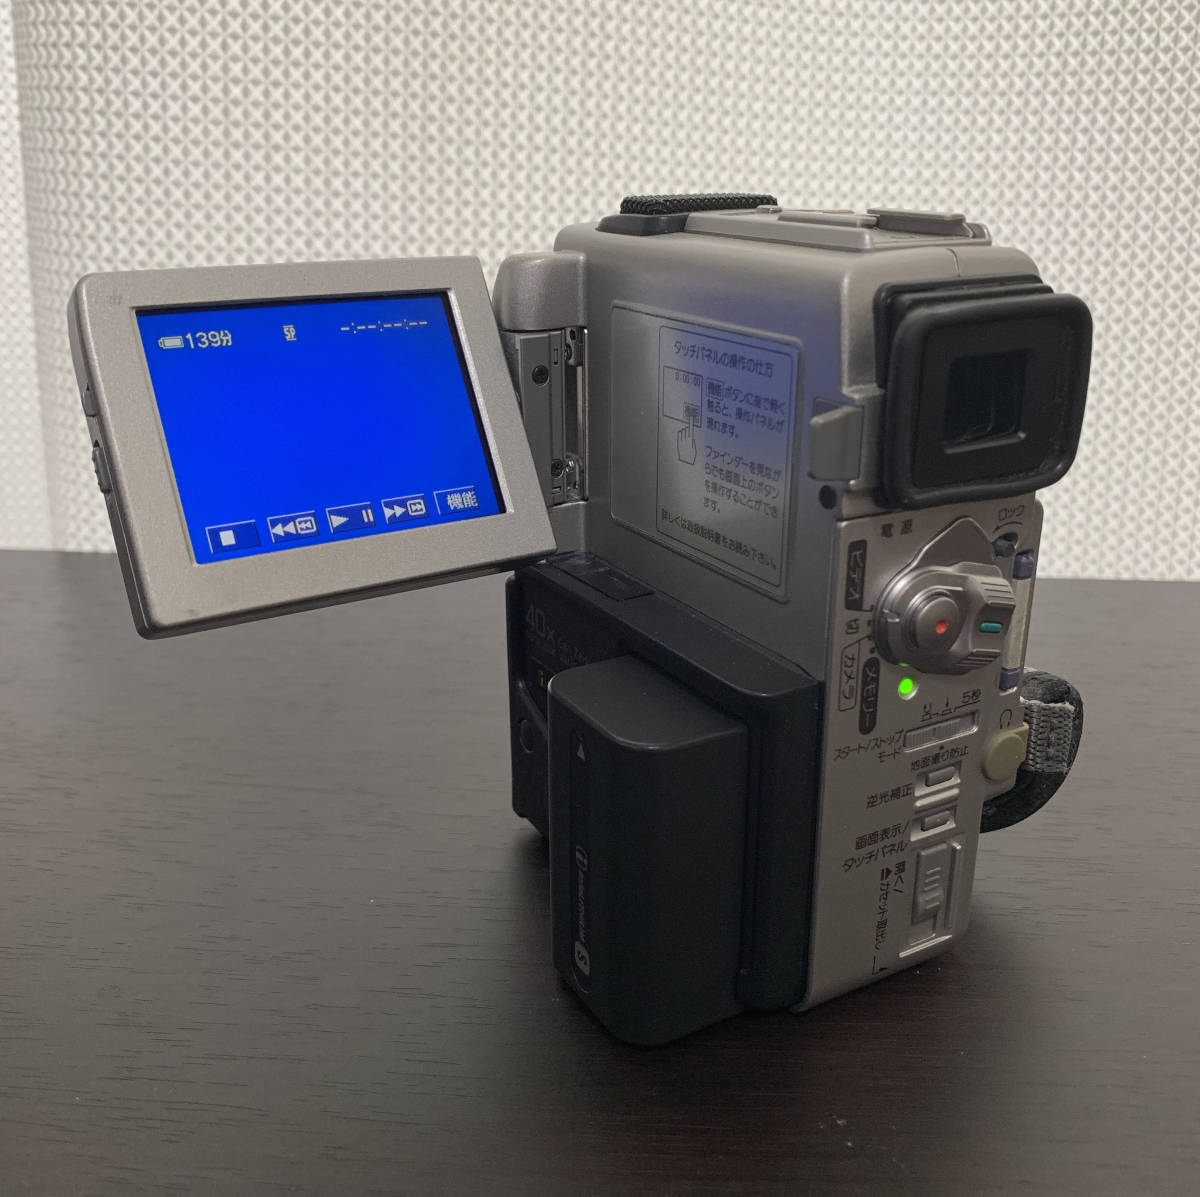 SONY DCR-PC3 デジタルビデオカメラレコーダー(デジタルハンディカム) mini DV_画像2